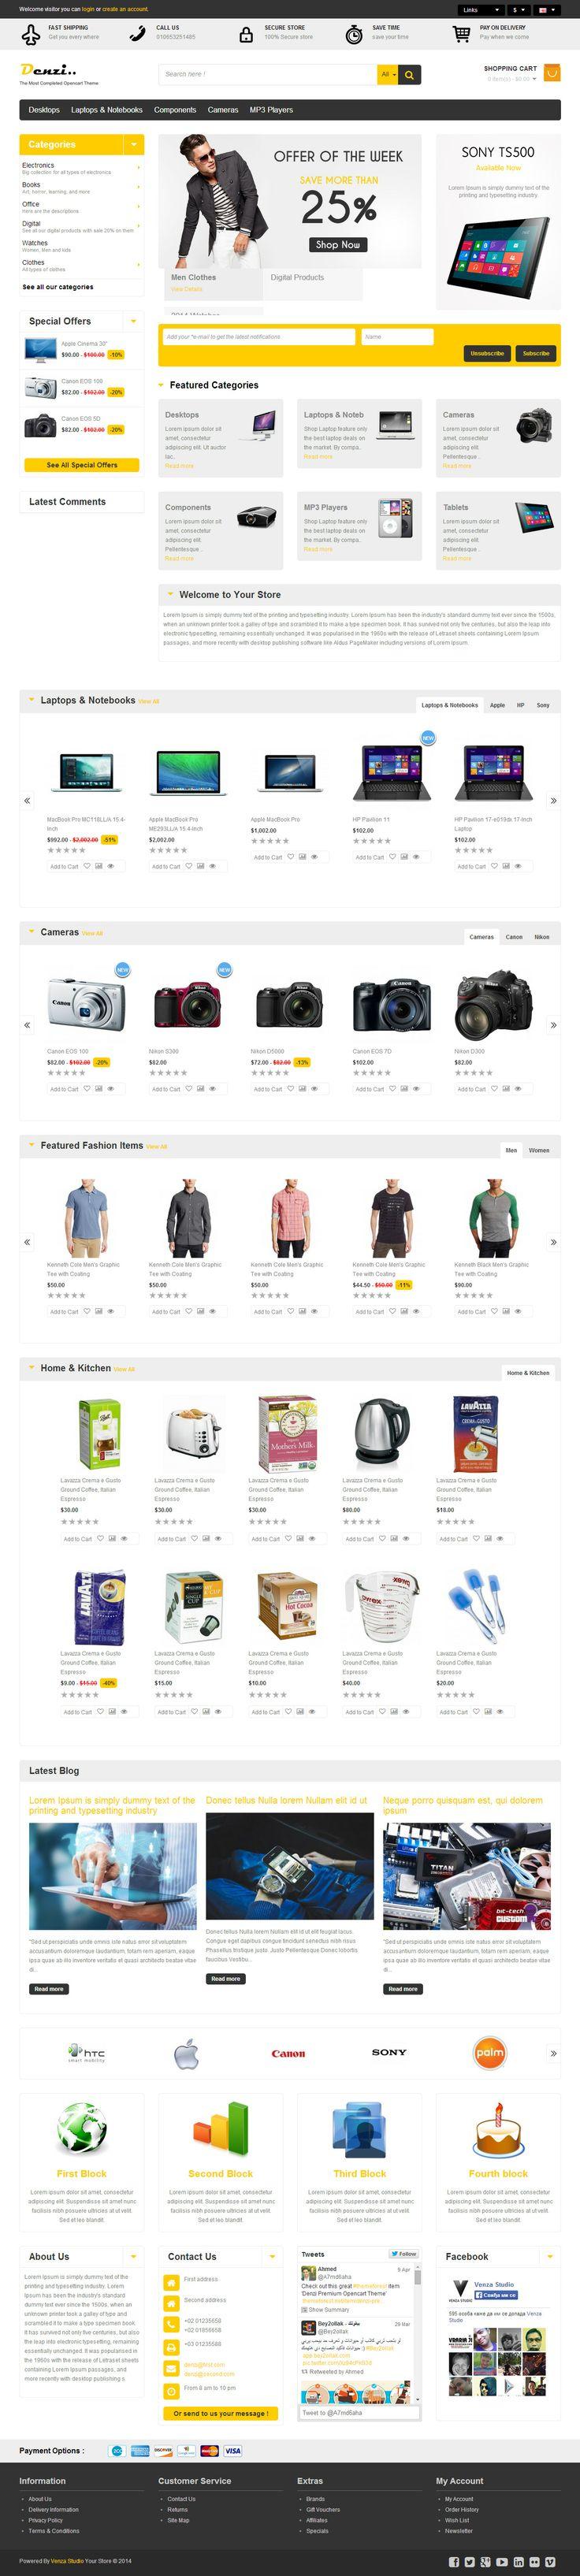 Denzi is Premium full Responsive OpenCart eCommerce Theme. Bootstrap Framework. Mega Menu. Page Builder. Master Slider.